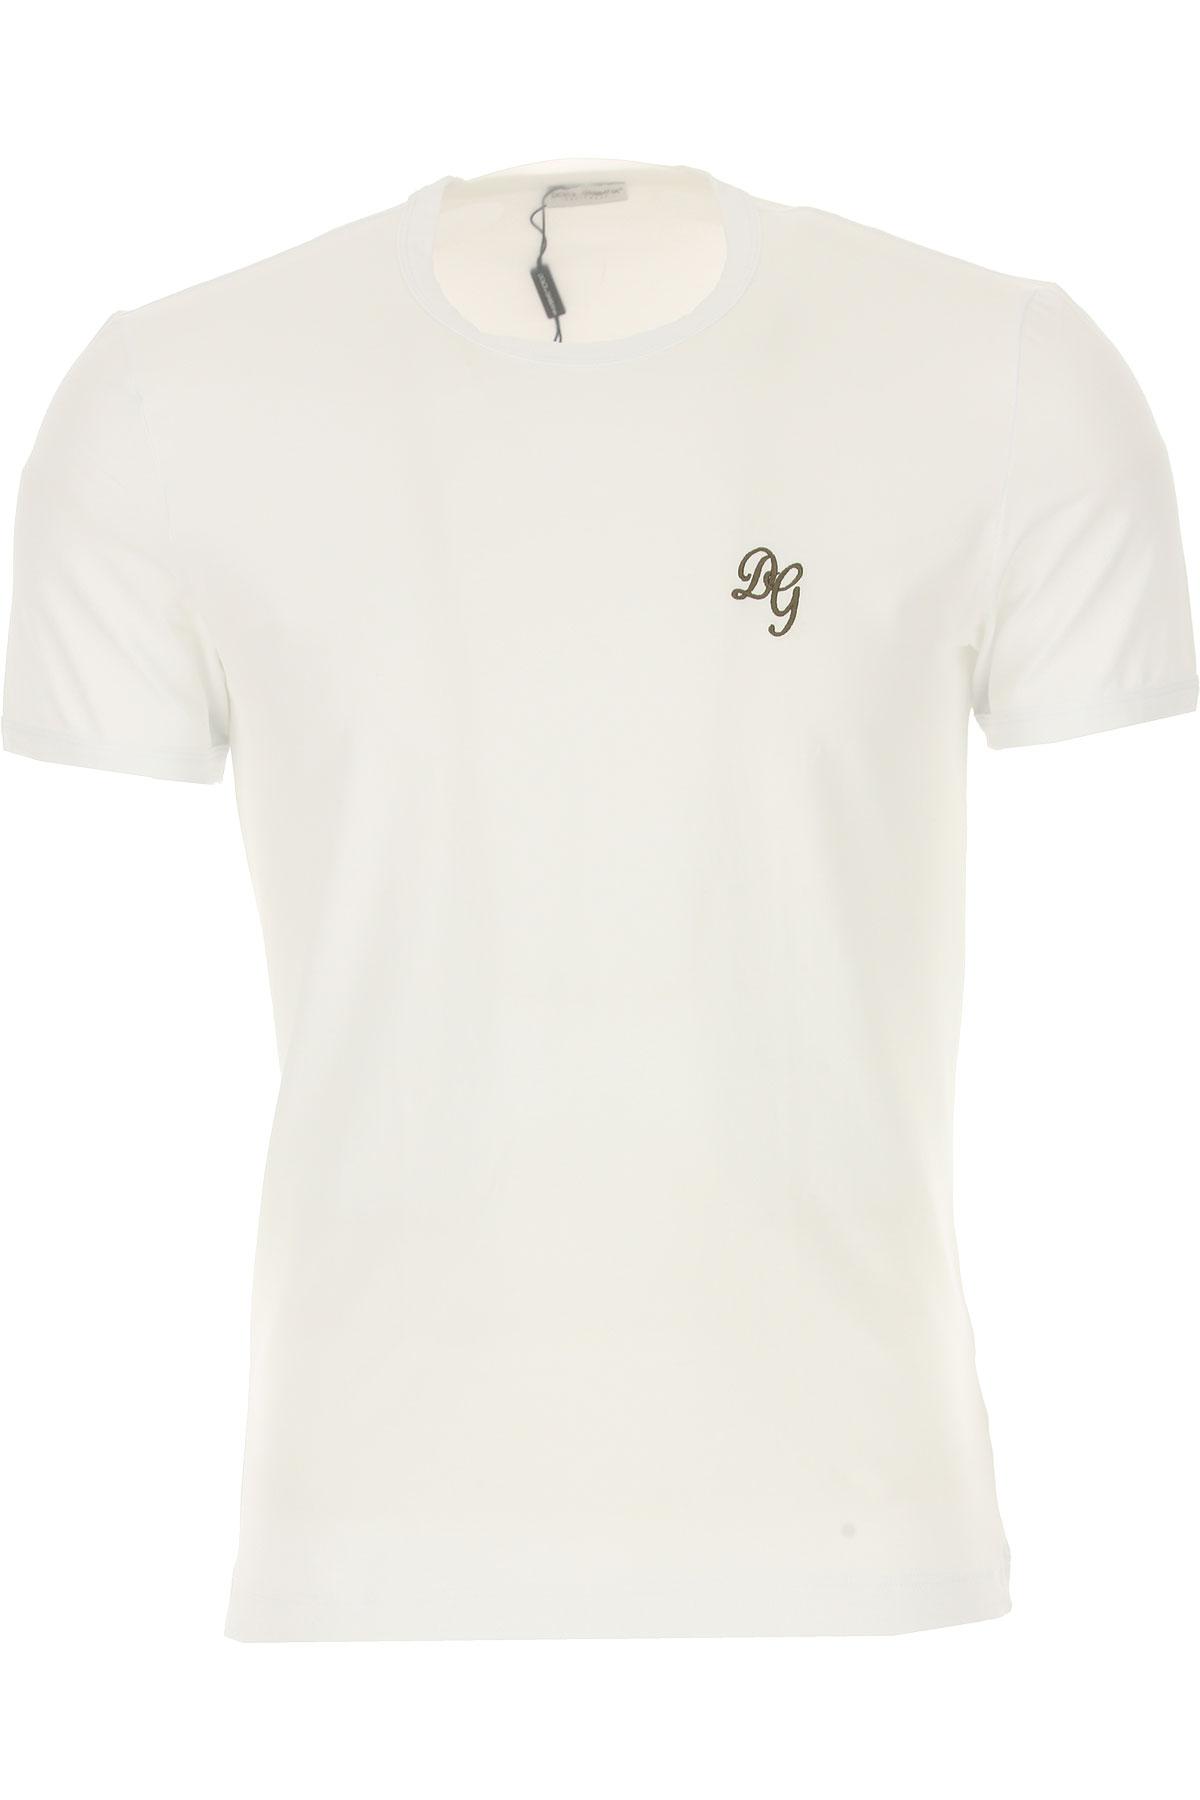 Image of Dolce & Gabbana T-Shirt for Men, White, Cotton, 2017, S (EU 3) M (EU 4) L (EU 5) XL (EU 6)